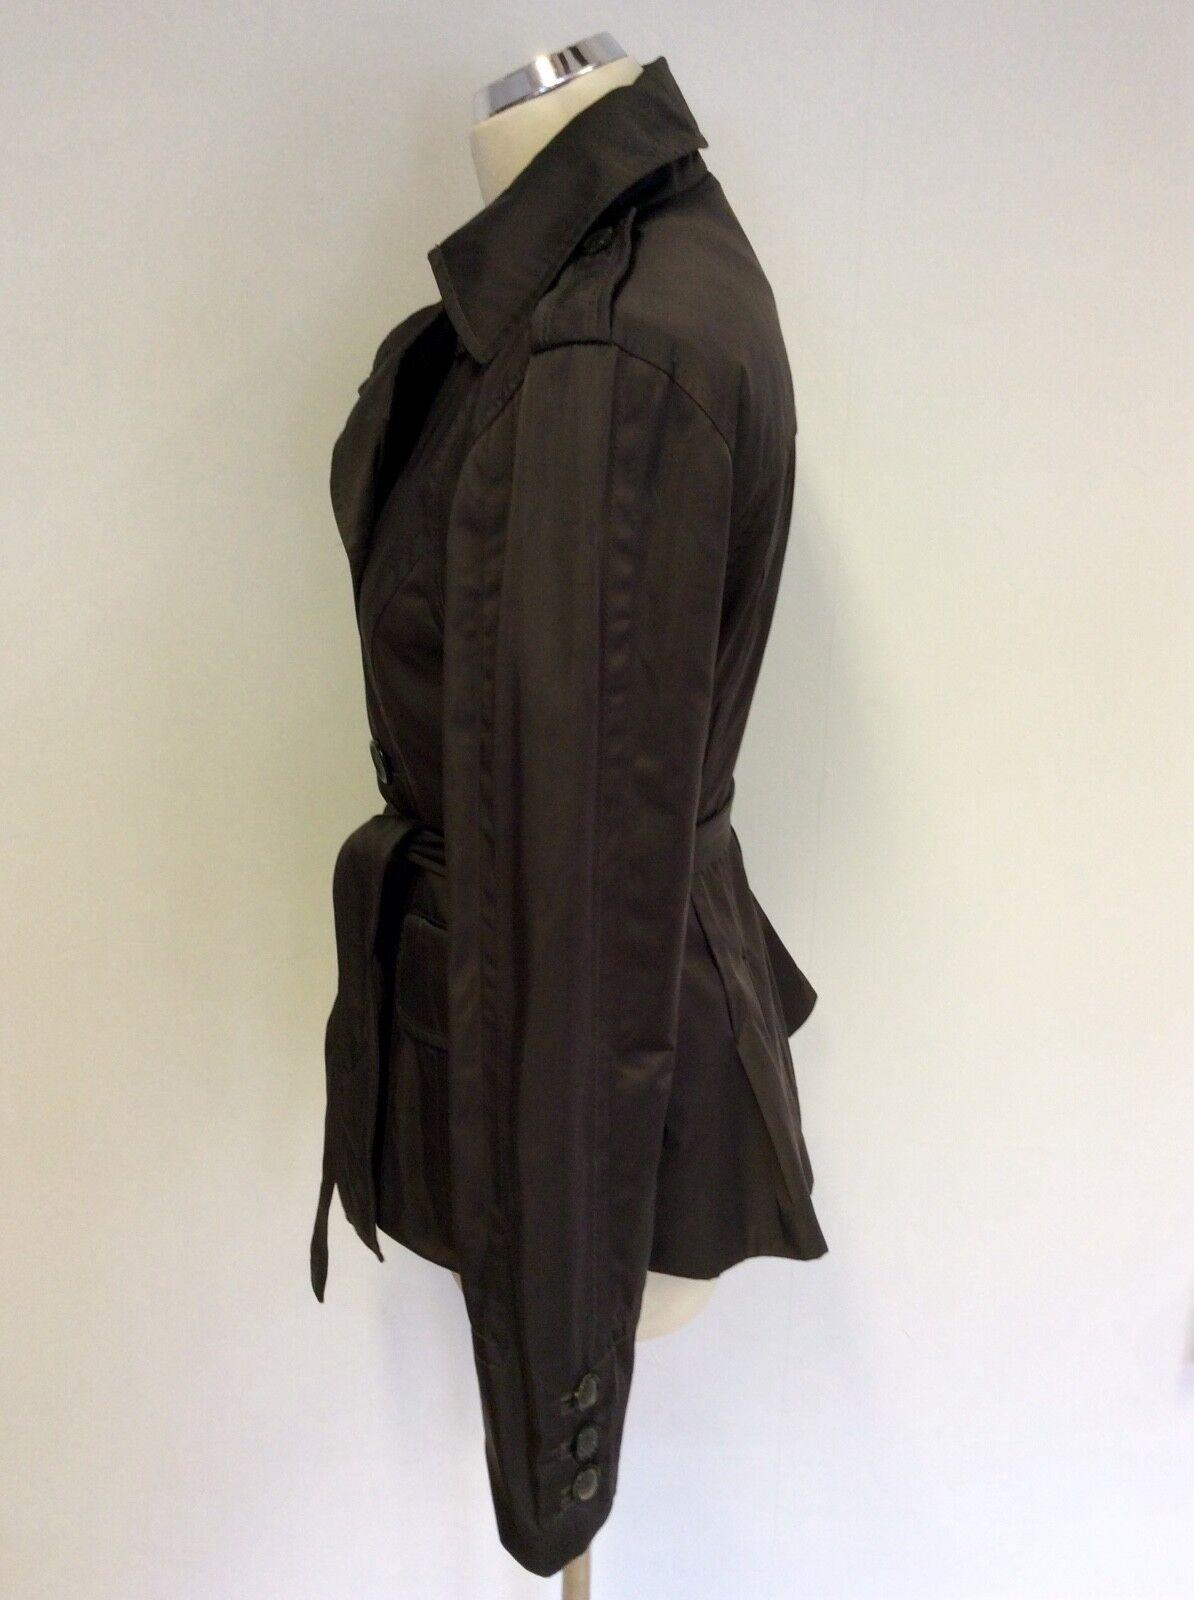 Taille Femme 62c700 Veste Ceinture Marron S Cravate Zara faqxwq